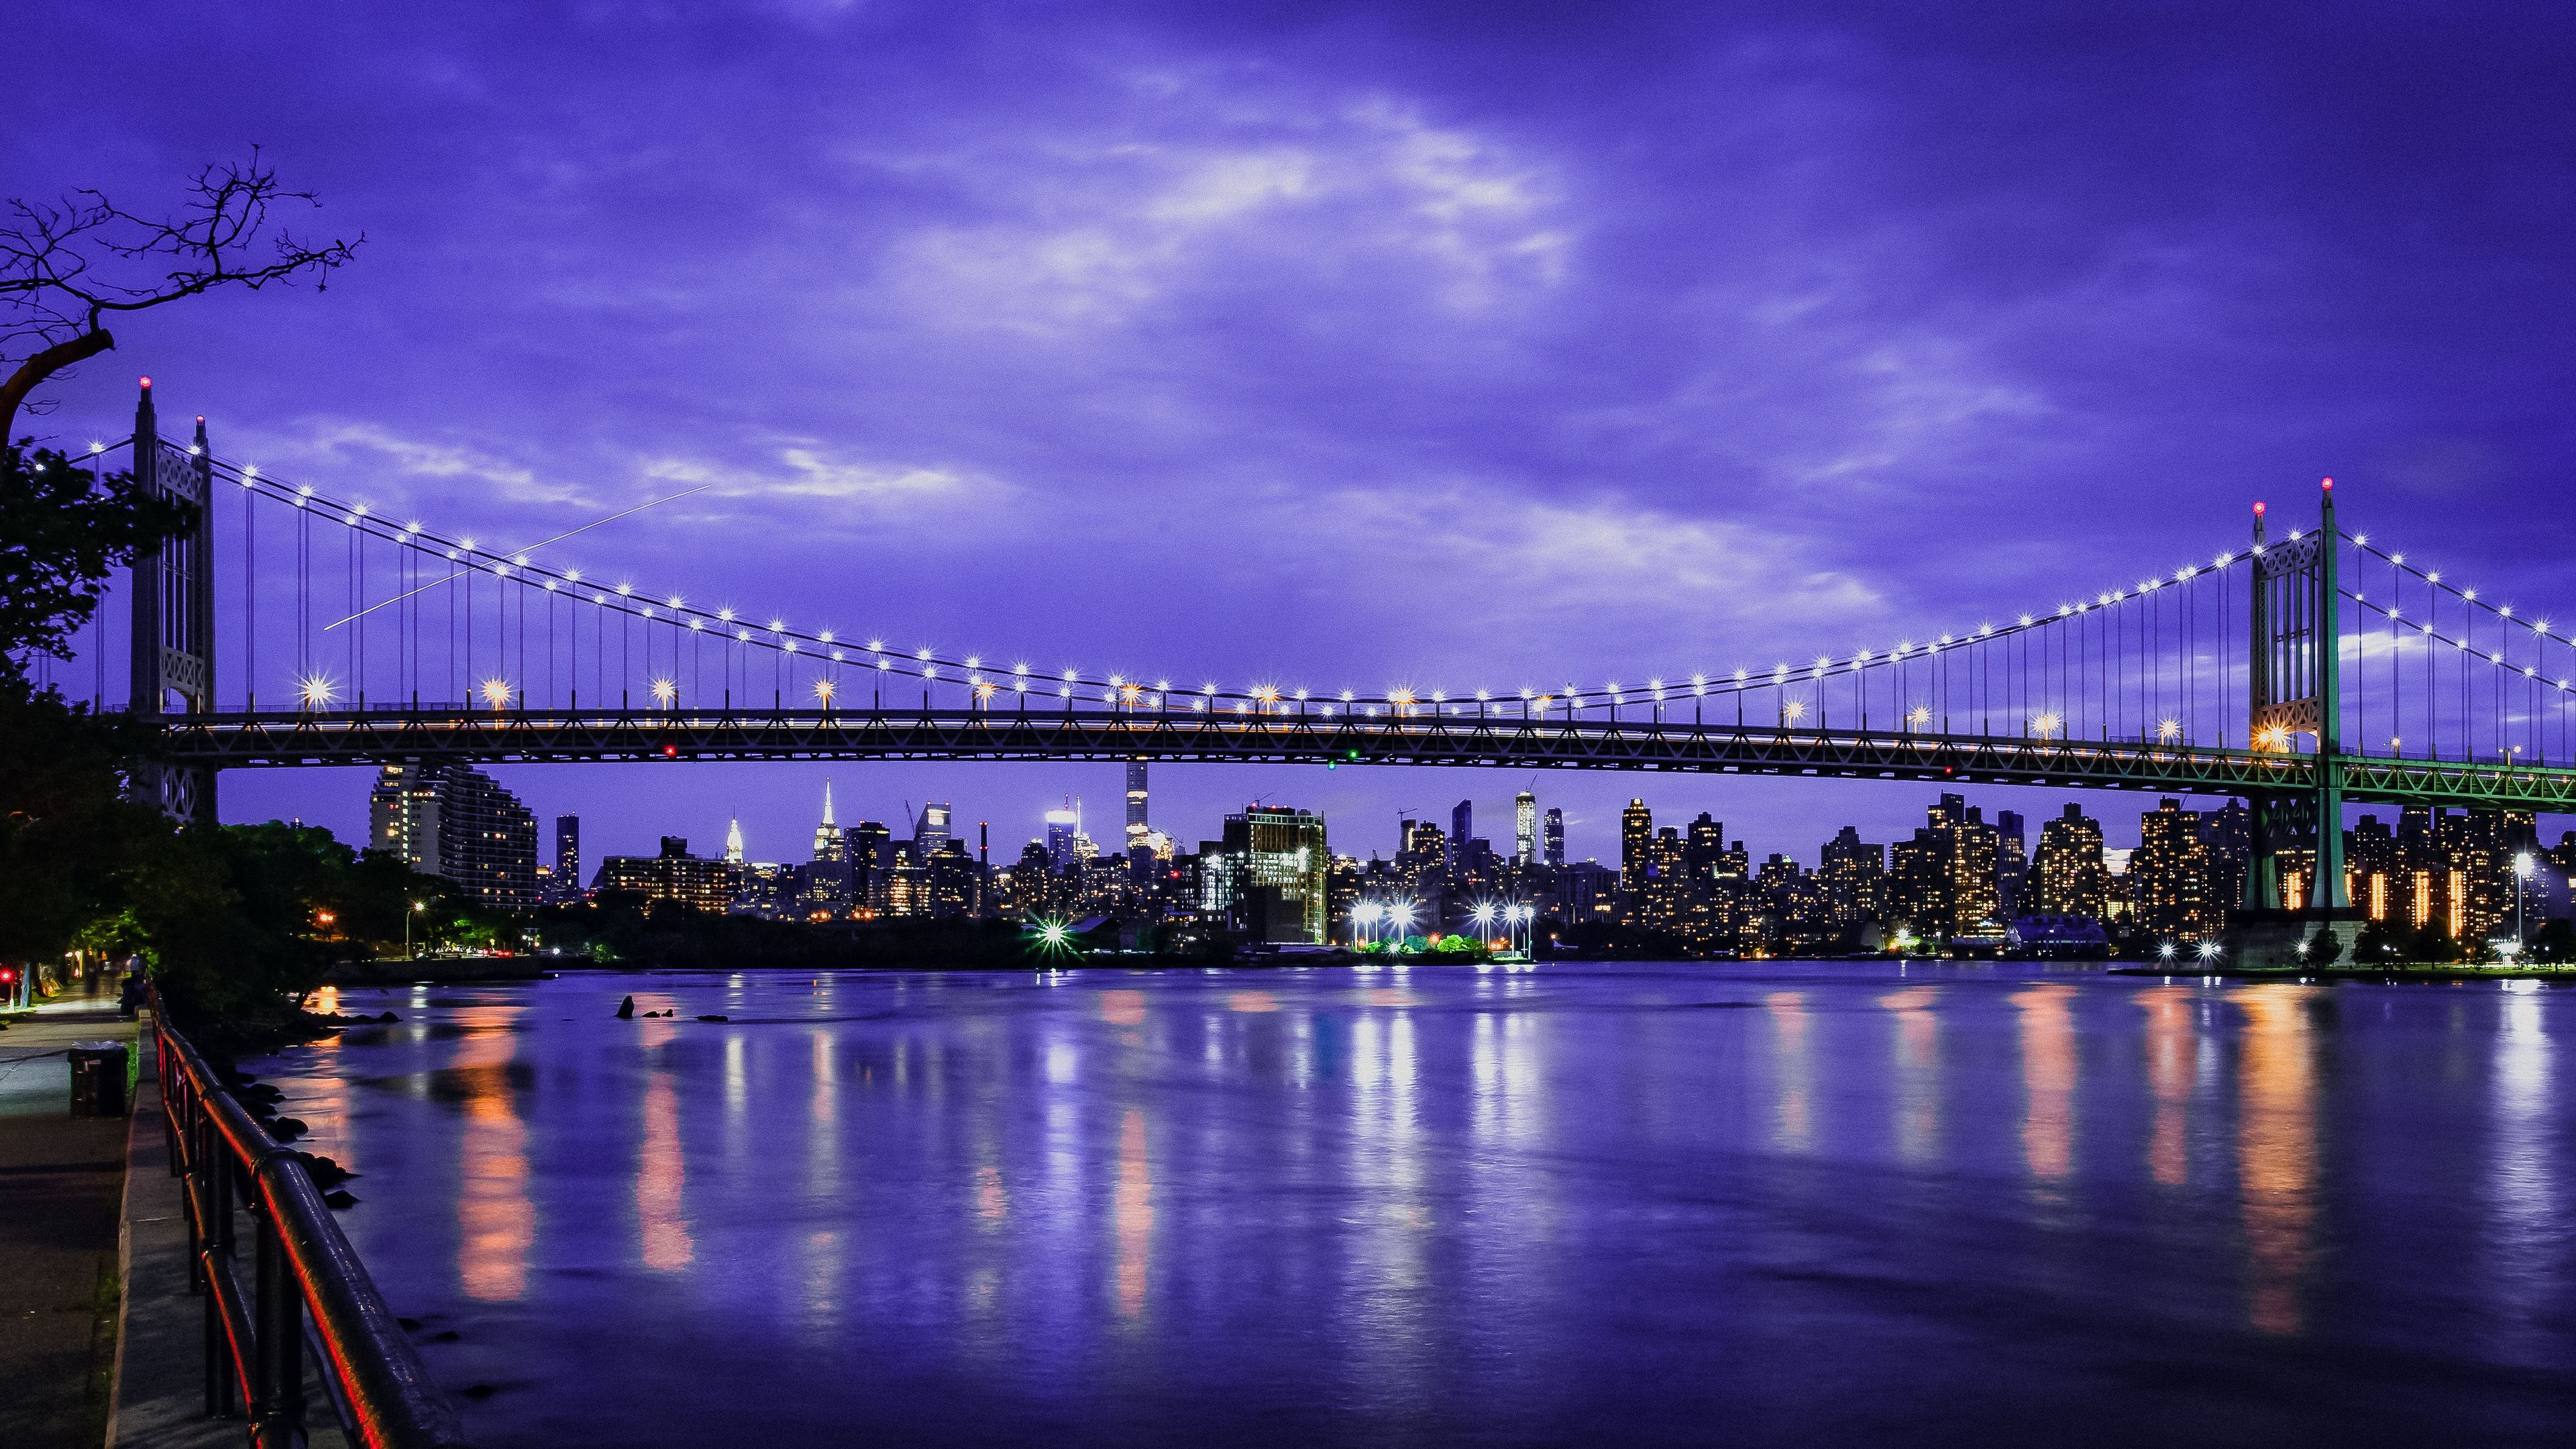 skyline triboro nyc bridge 1538072093 - Skyline Triboro Nyc Bridge - world wallpapers, new york wallpapers, hd-wallpapers, bridge wallpapers